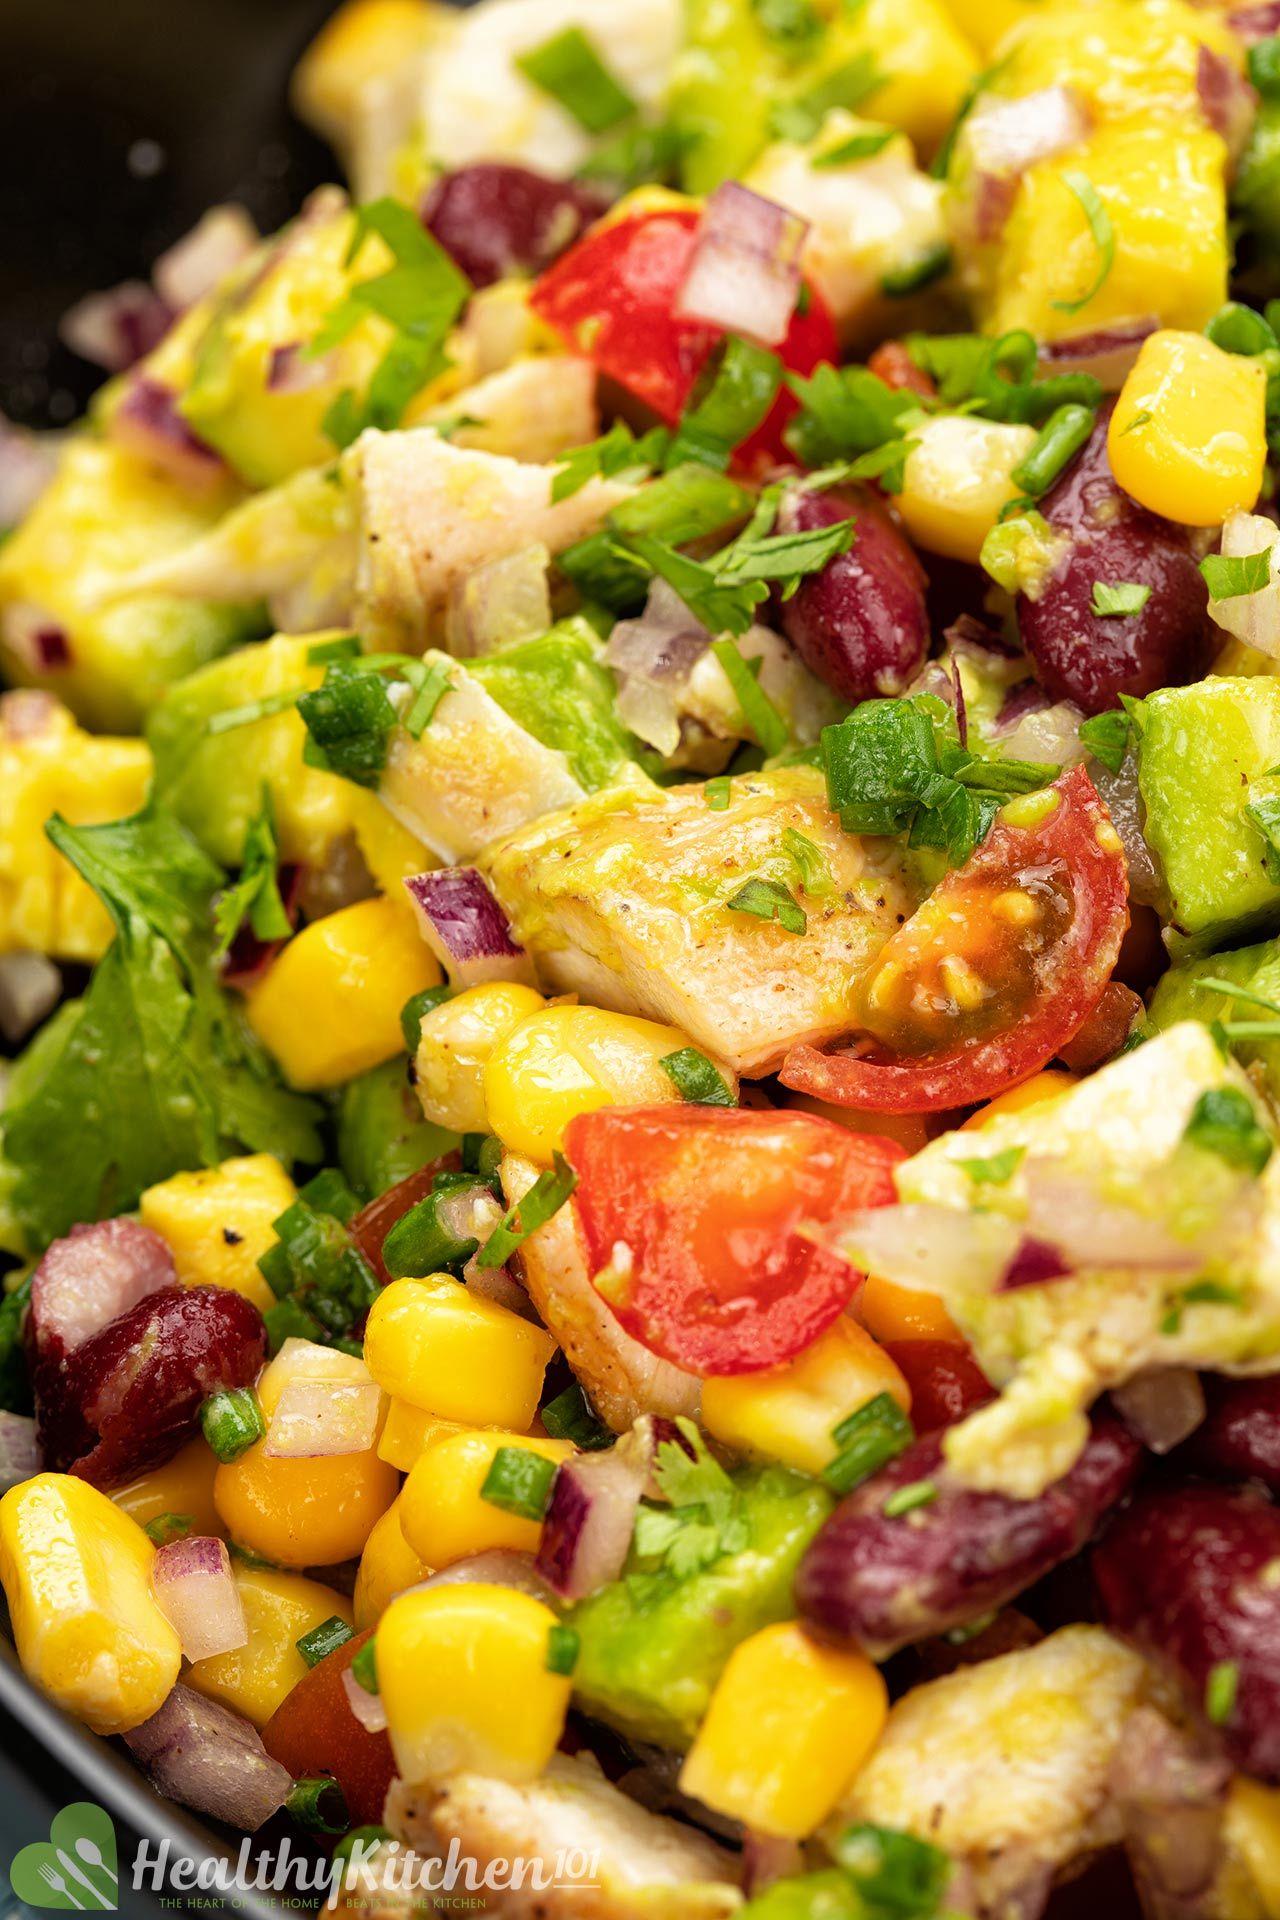 Homemade Avocado Chicken Salad Recipe